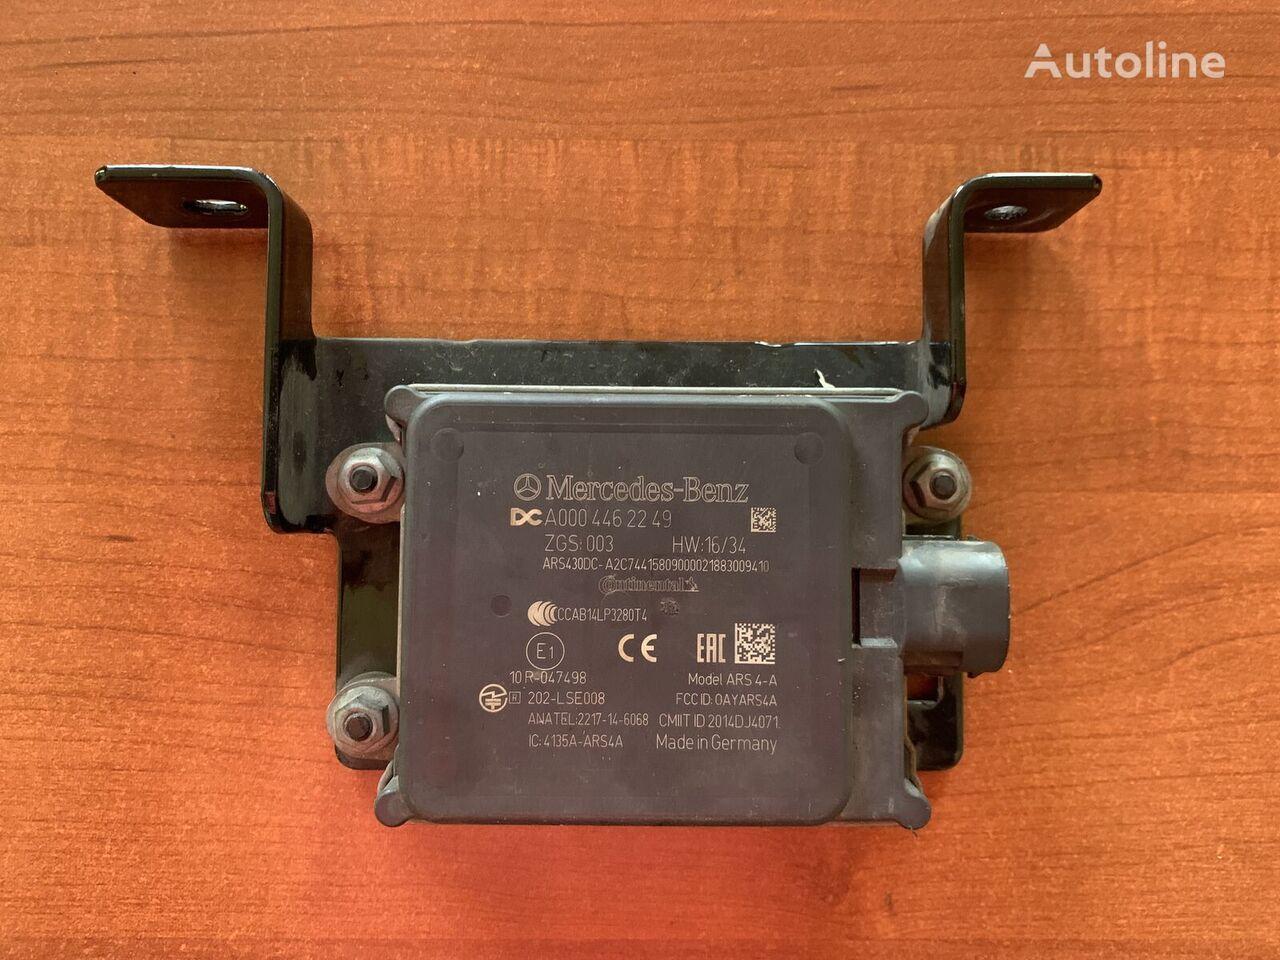 MERCEDES-BENZ (A0004462249) unidad de control para MERCEDES-BENZ ACTROS  tractora